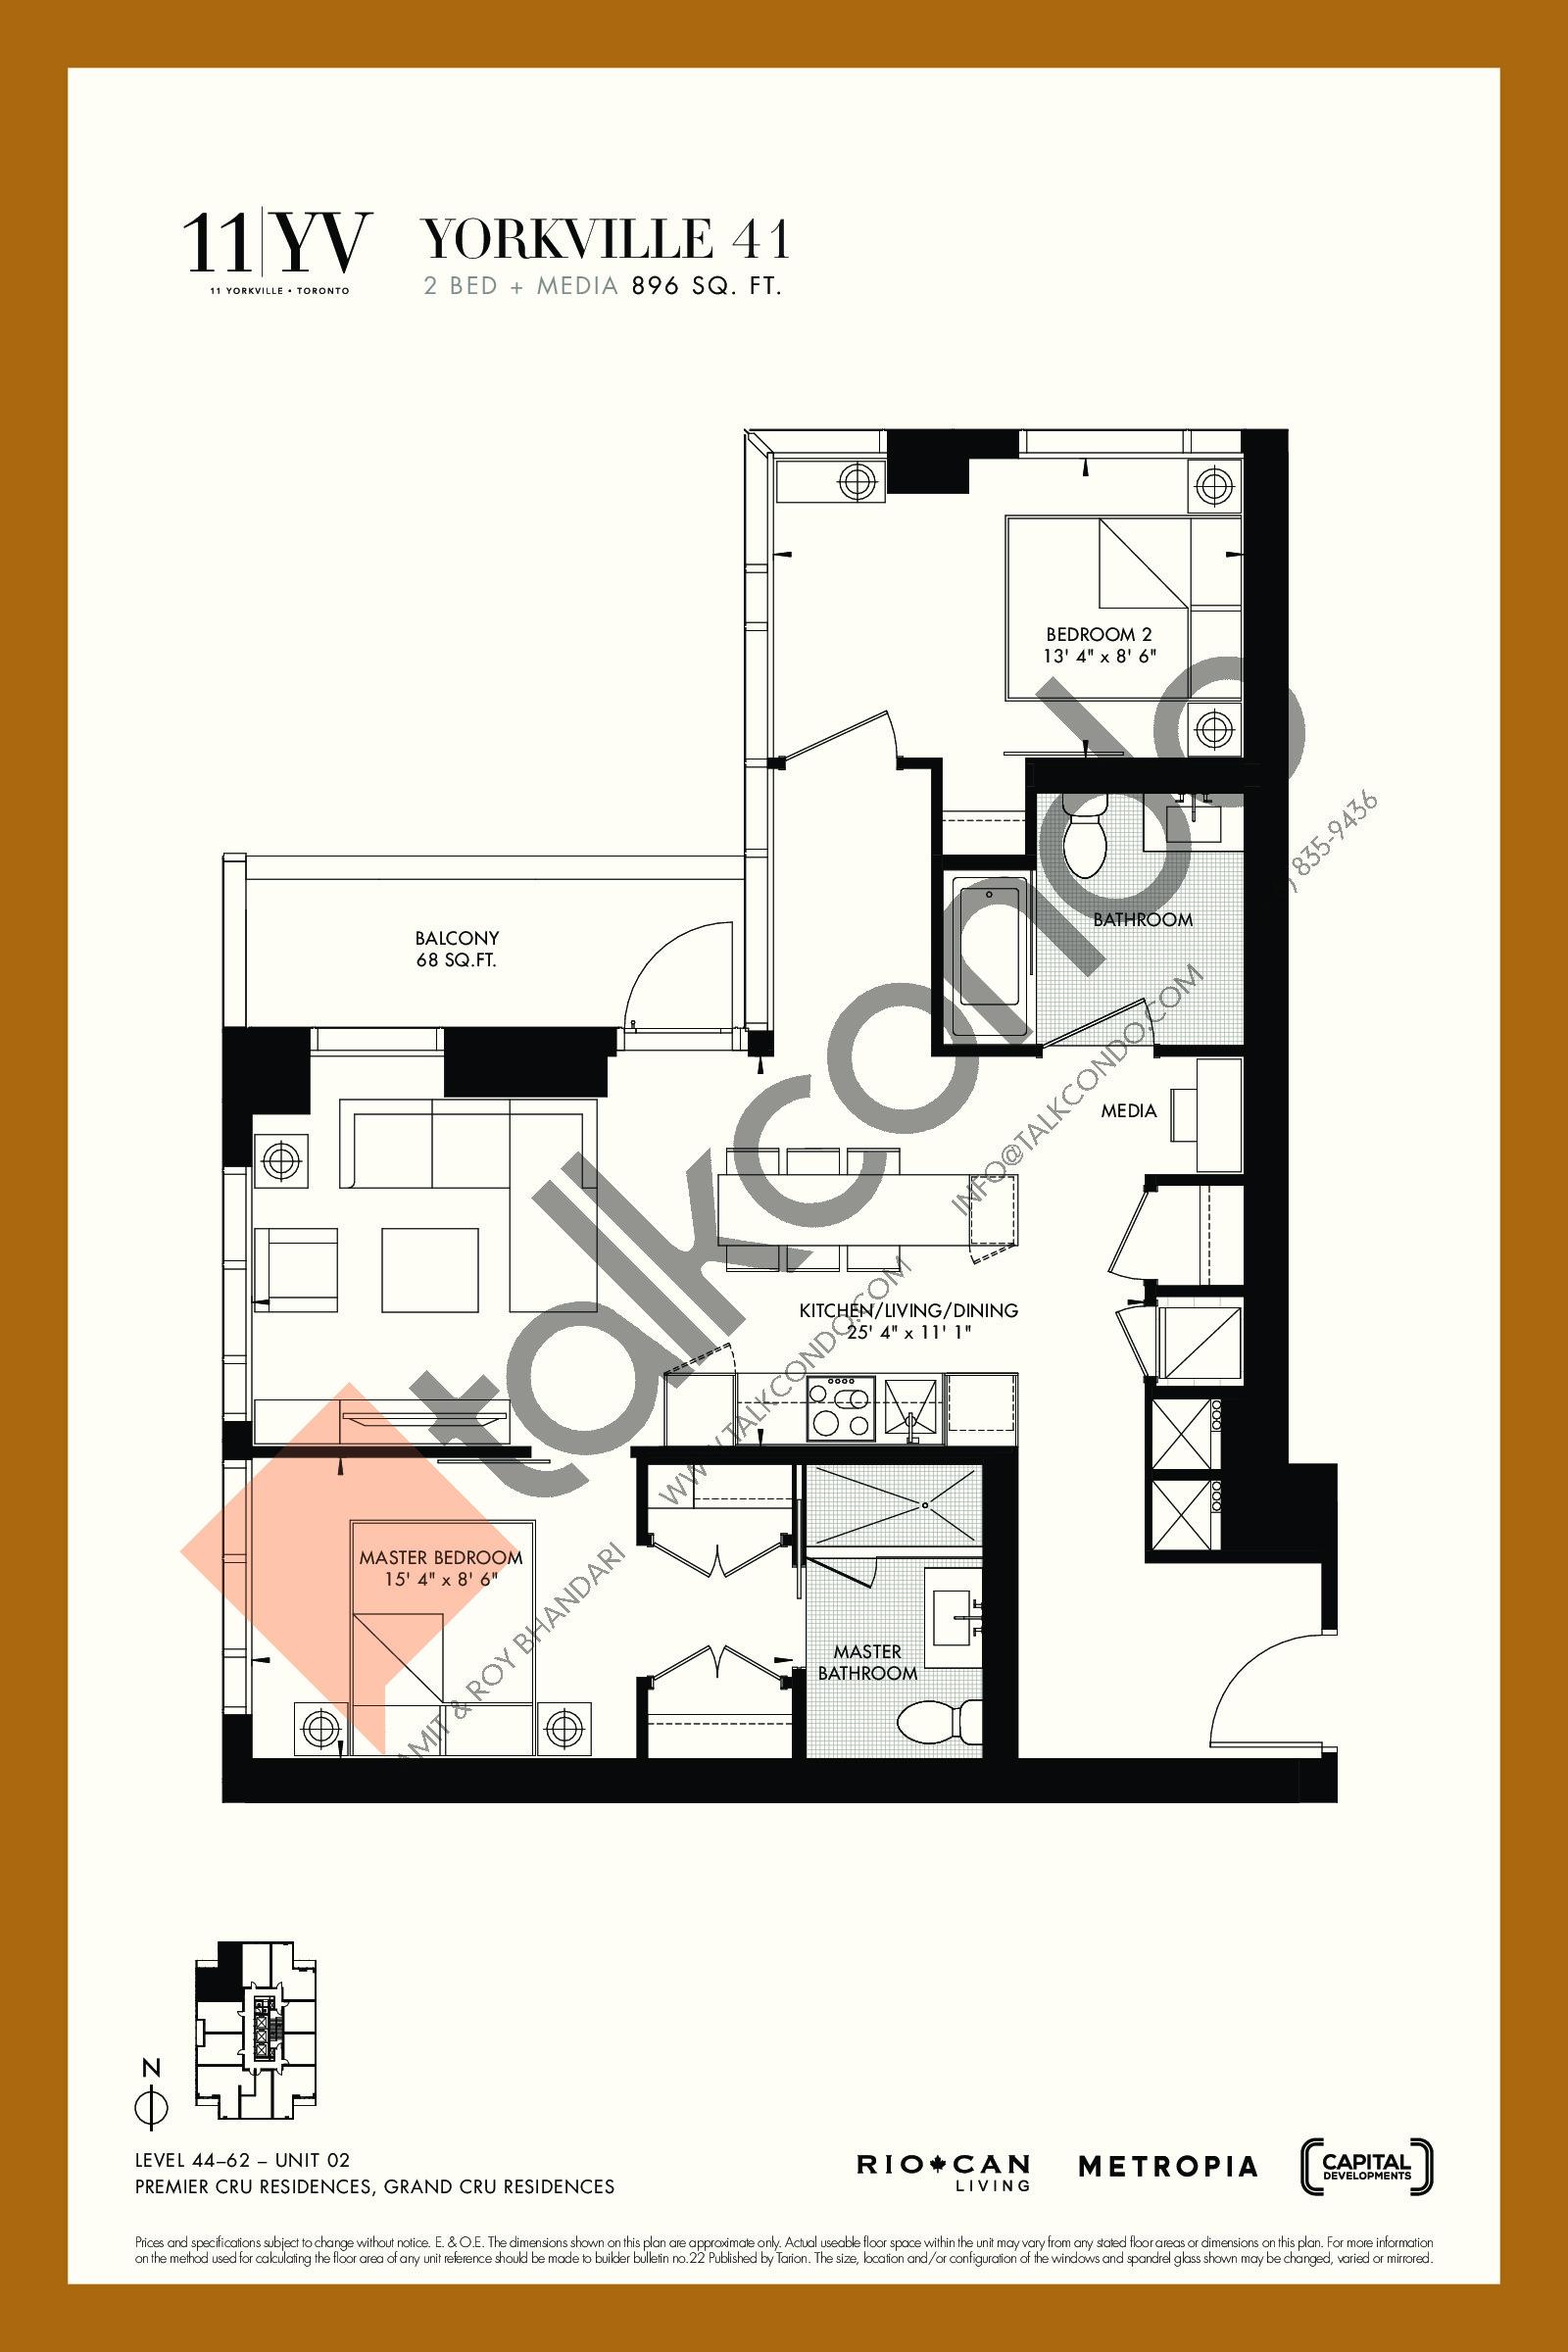 Yorkville 41 Floor Plan at 11YV Condos - 896 sq.ft